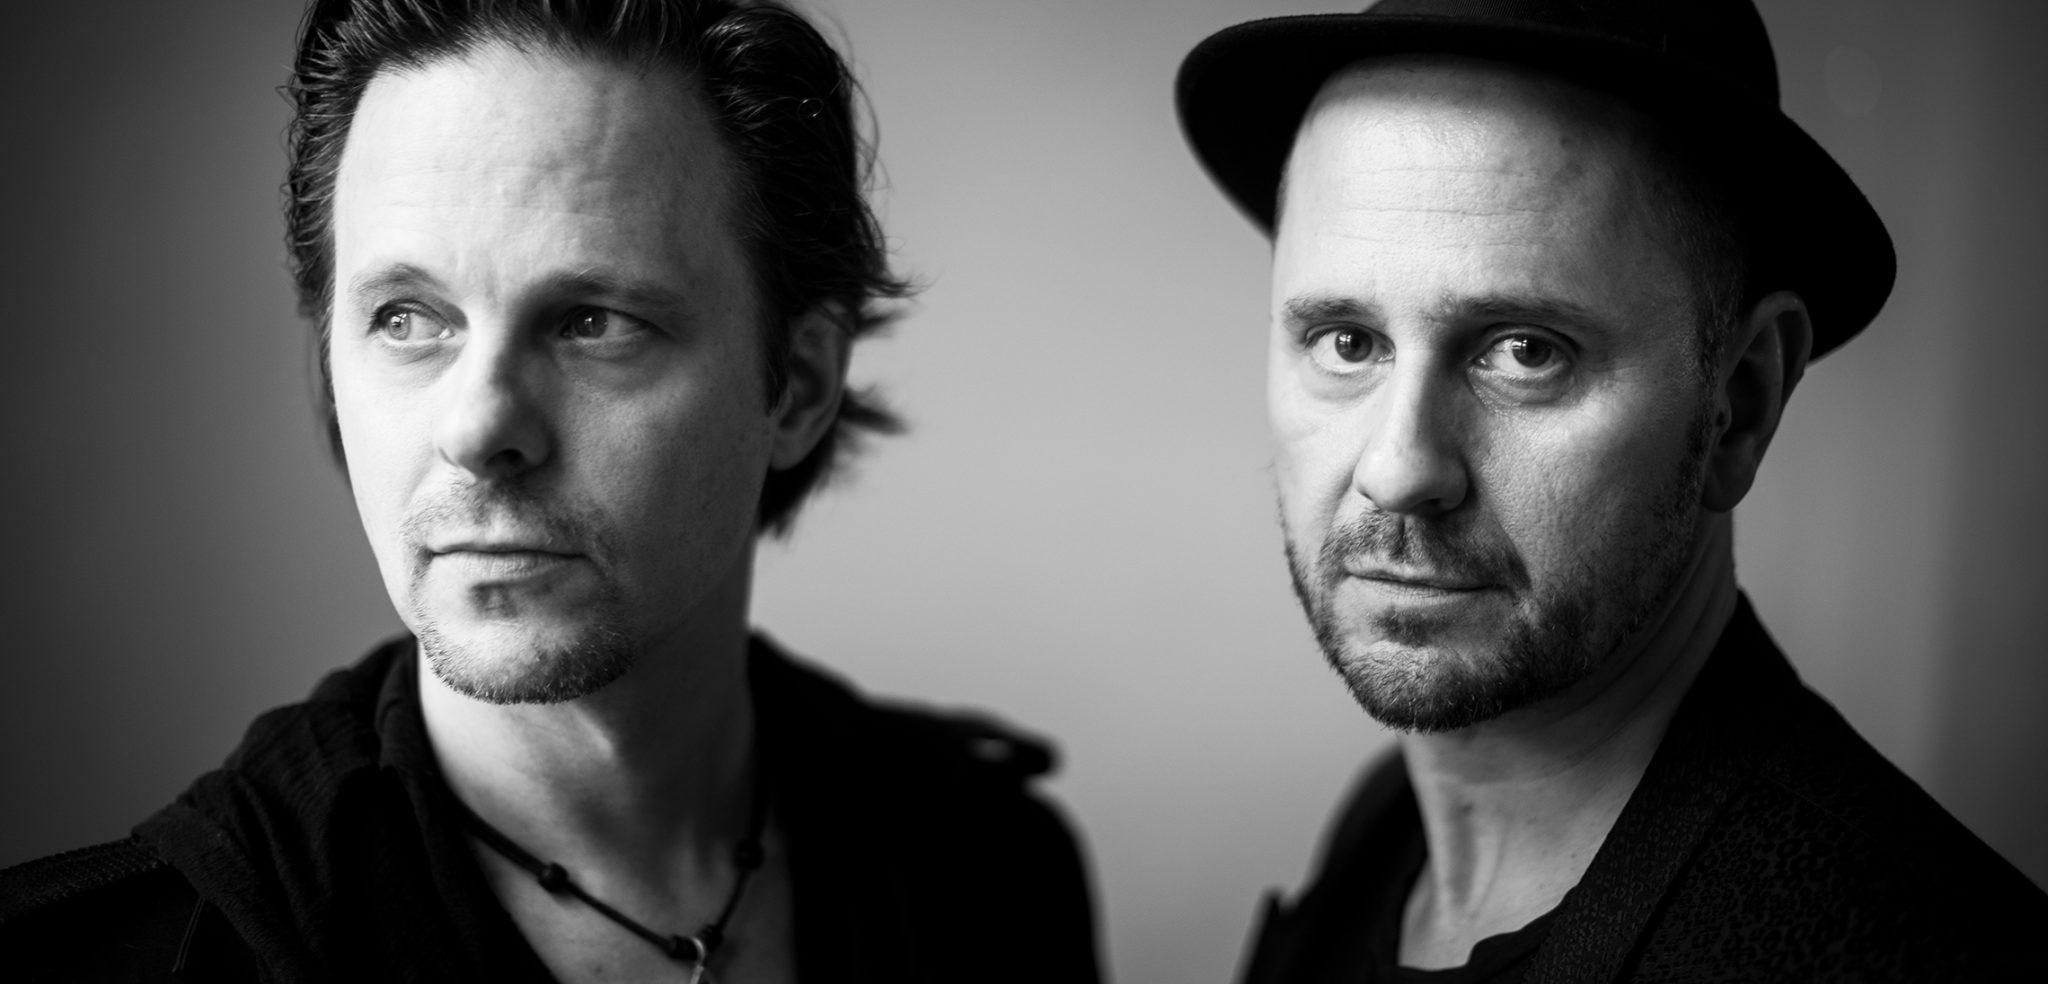 Booka Shade - Cut The Strings (Claude Von Stroke, Yousef, Wes Wieland - Album Remixes 1) hero